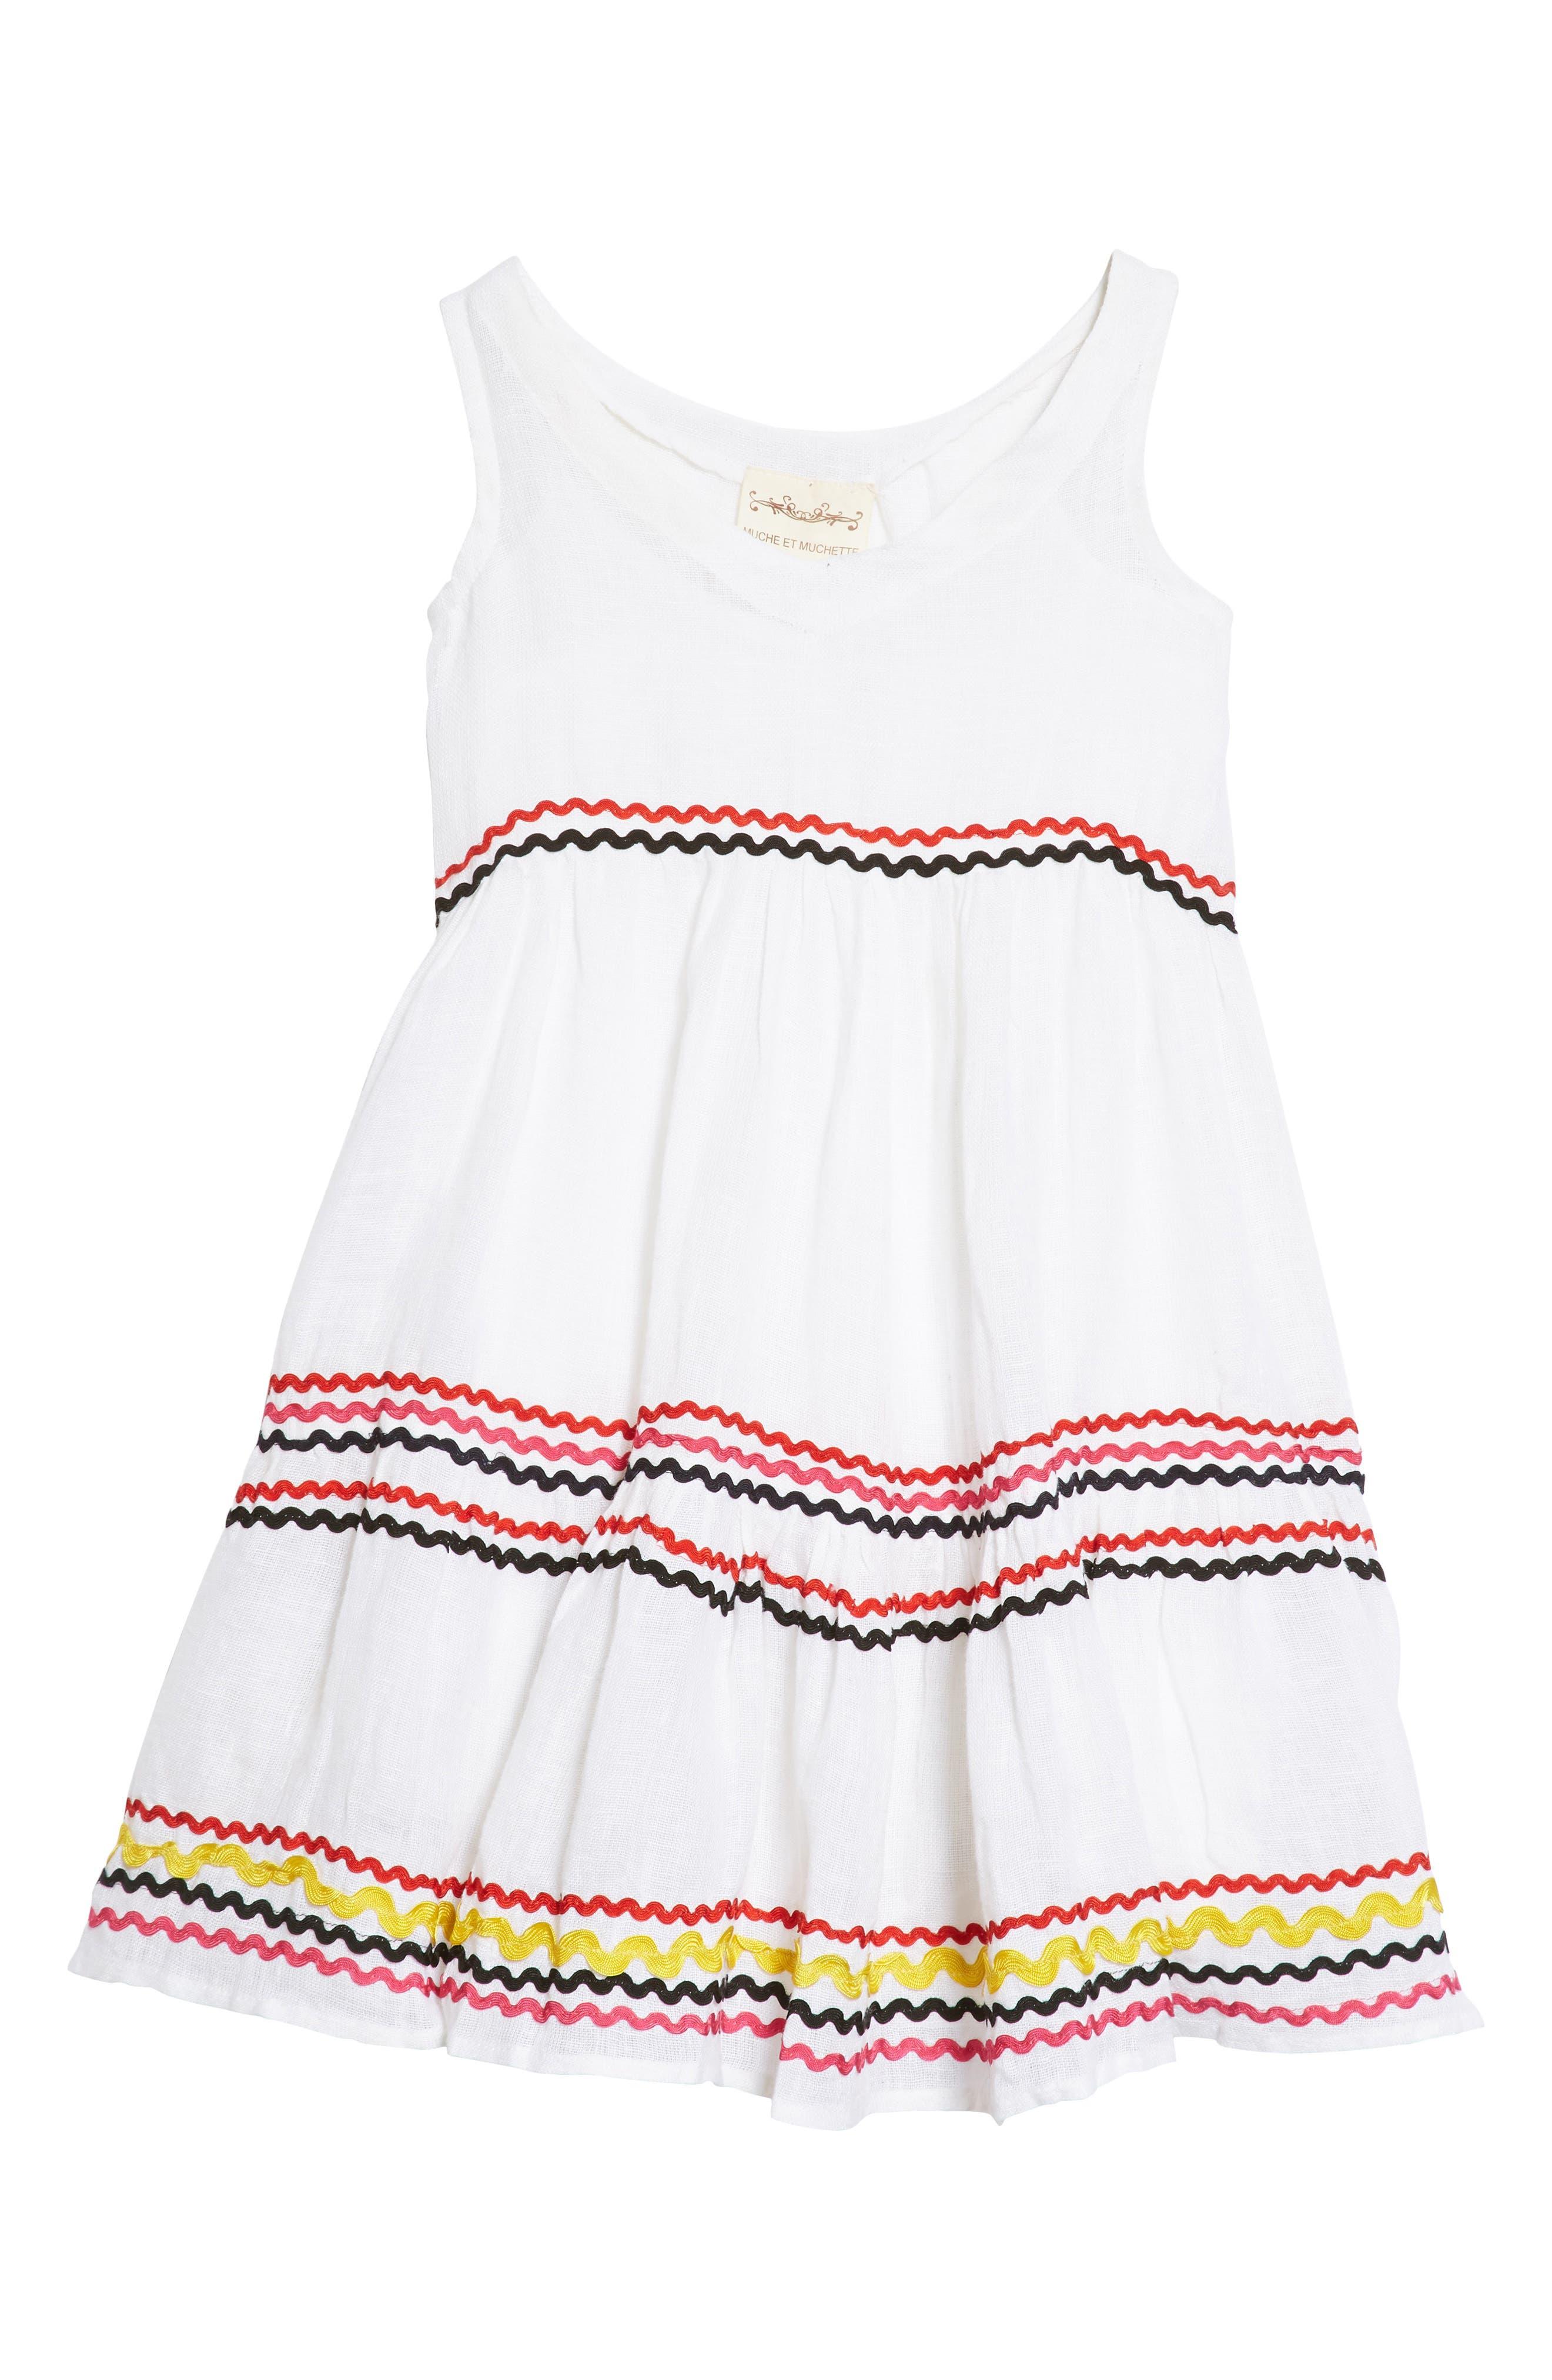 Mira Linen Dress,                             Main thumbnail 1, color,                             Wht-Mlt